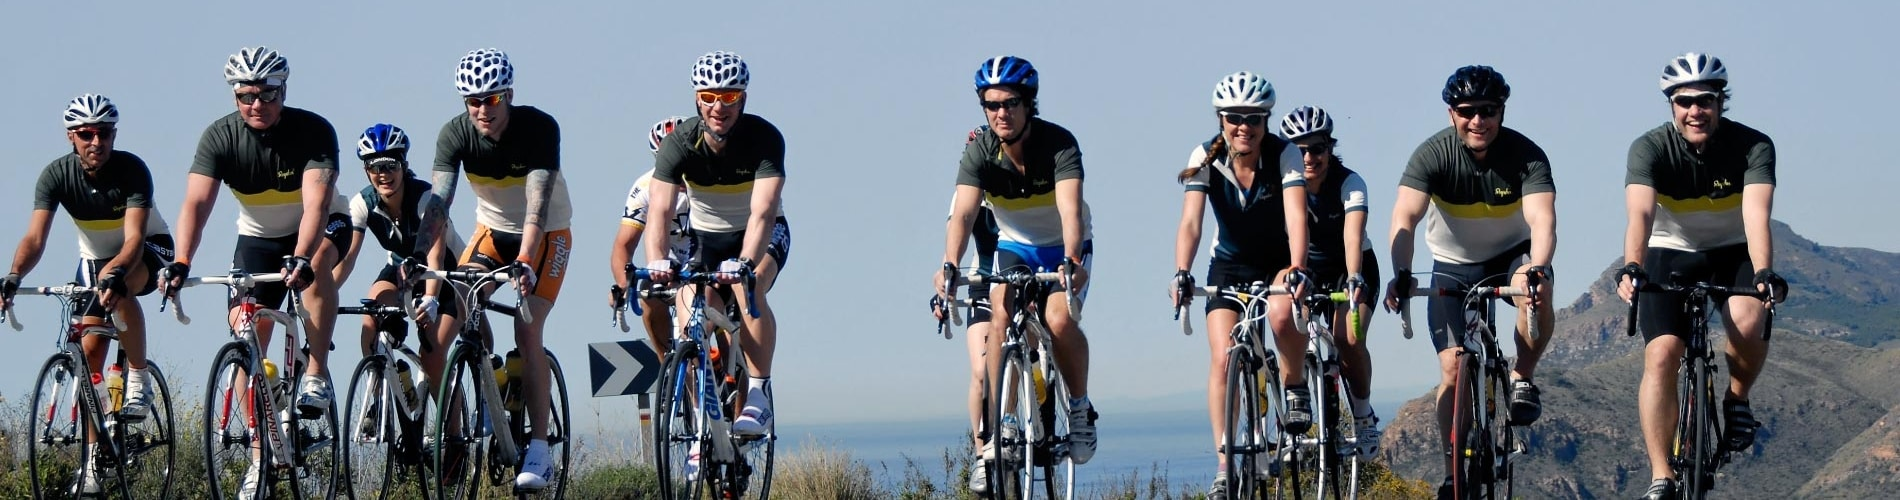 La Manga Club Triathlon, Cycling & Running